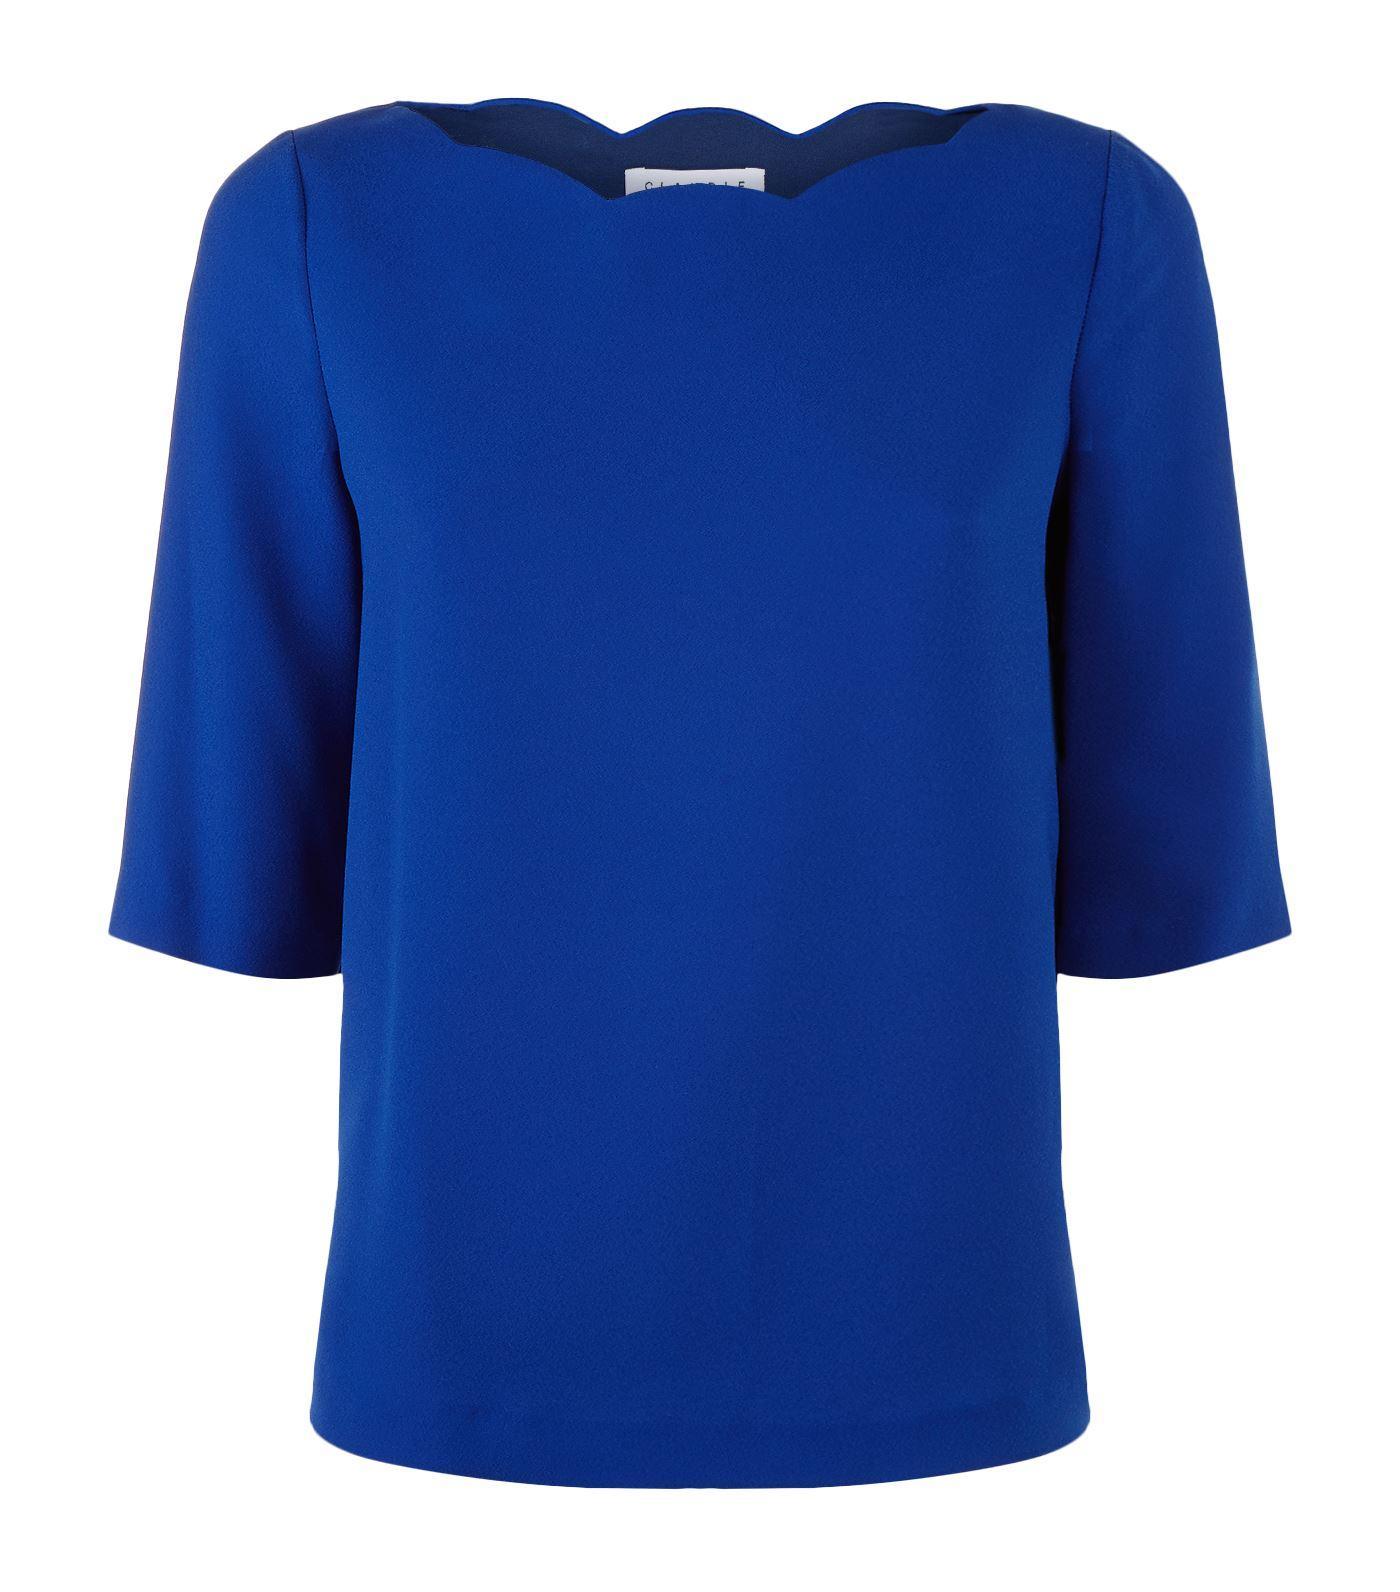 Claudie Pierlot Scalloped Neck Top In Blue